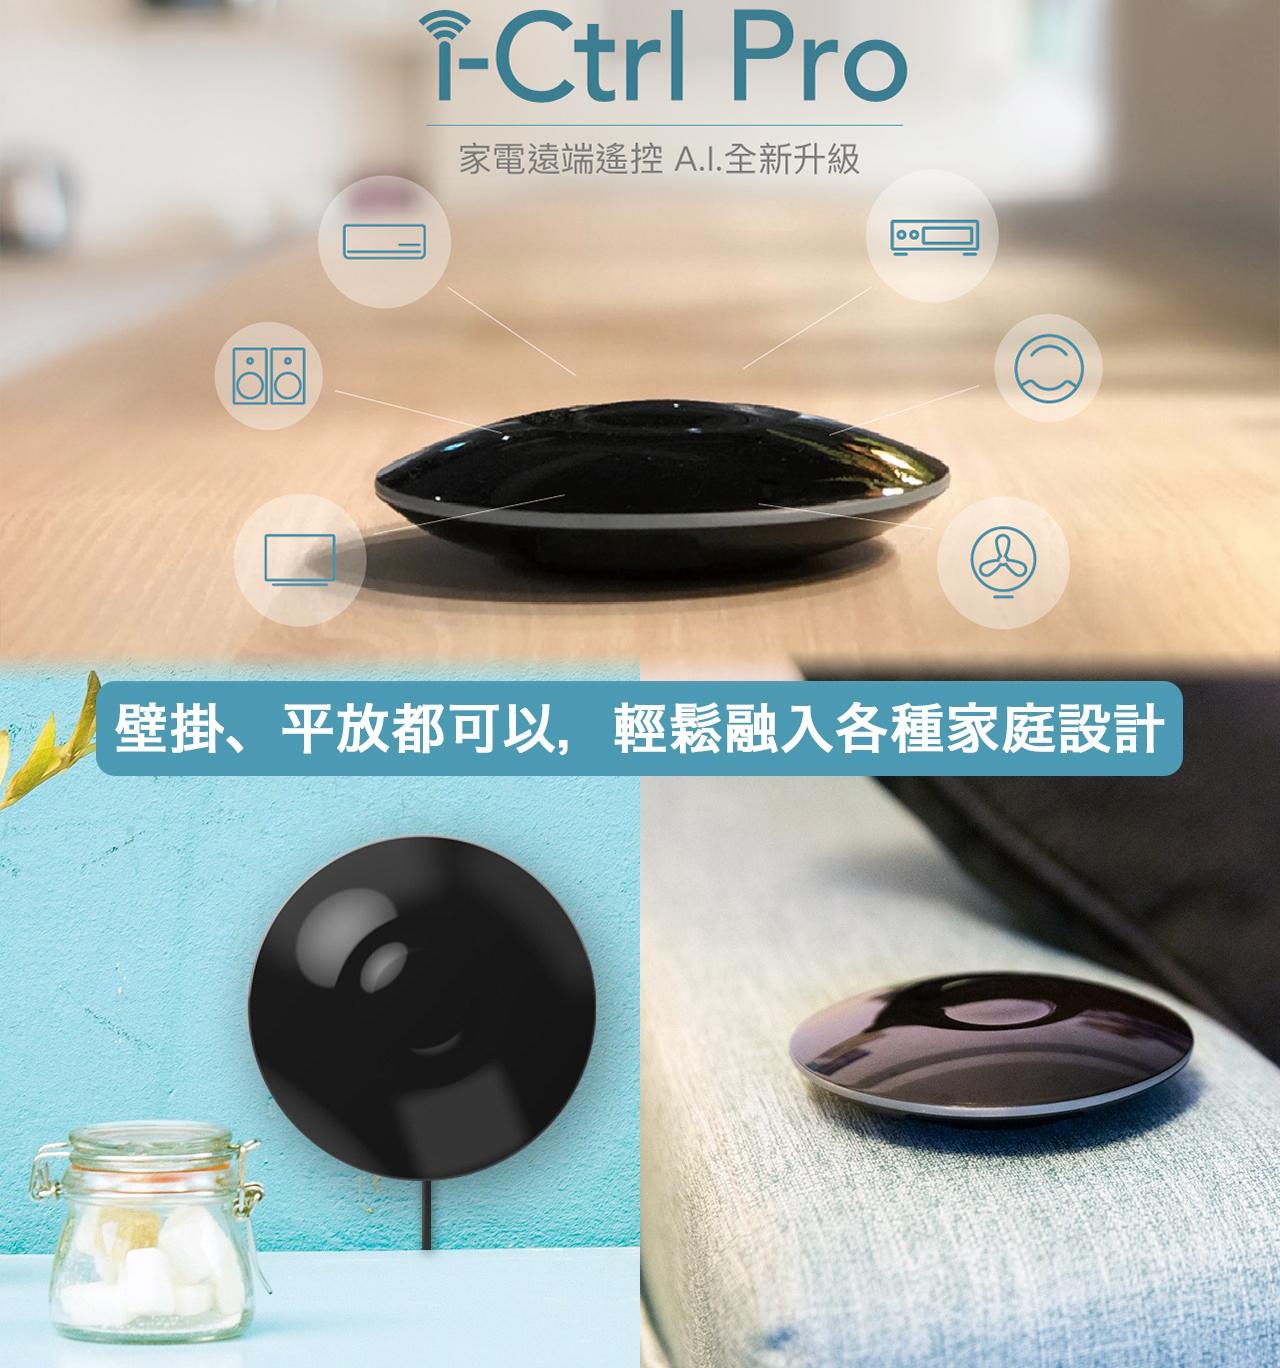 aifa-i-Ctrl-pro-crowdfunding-smart-remote-flyingv6